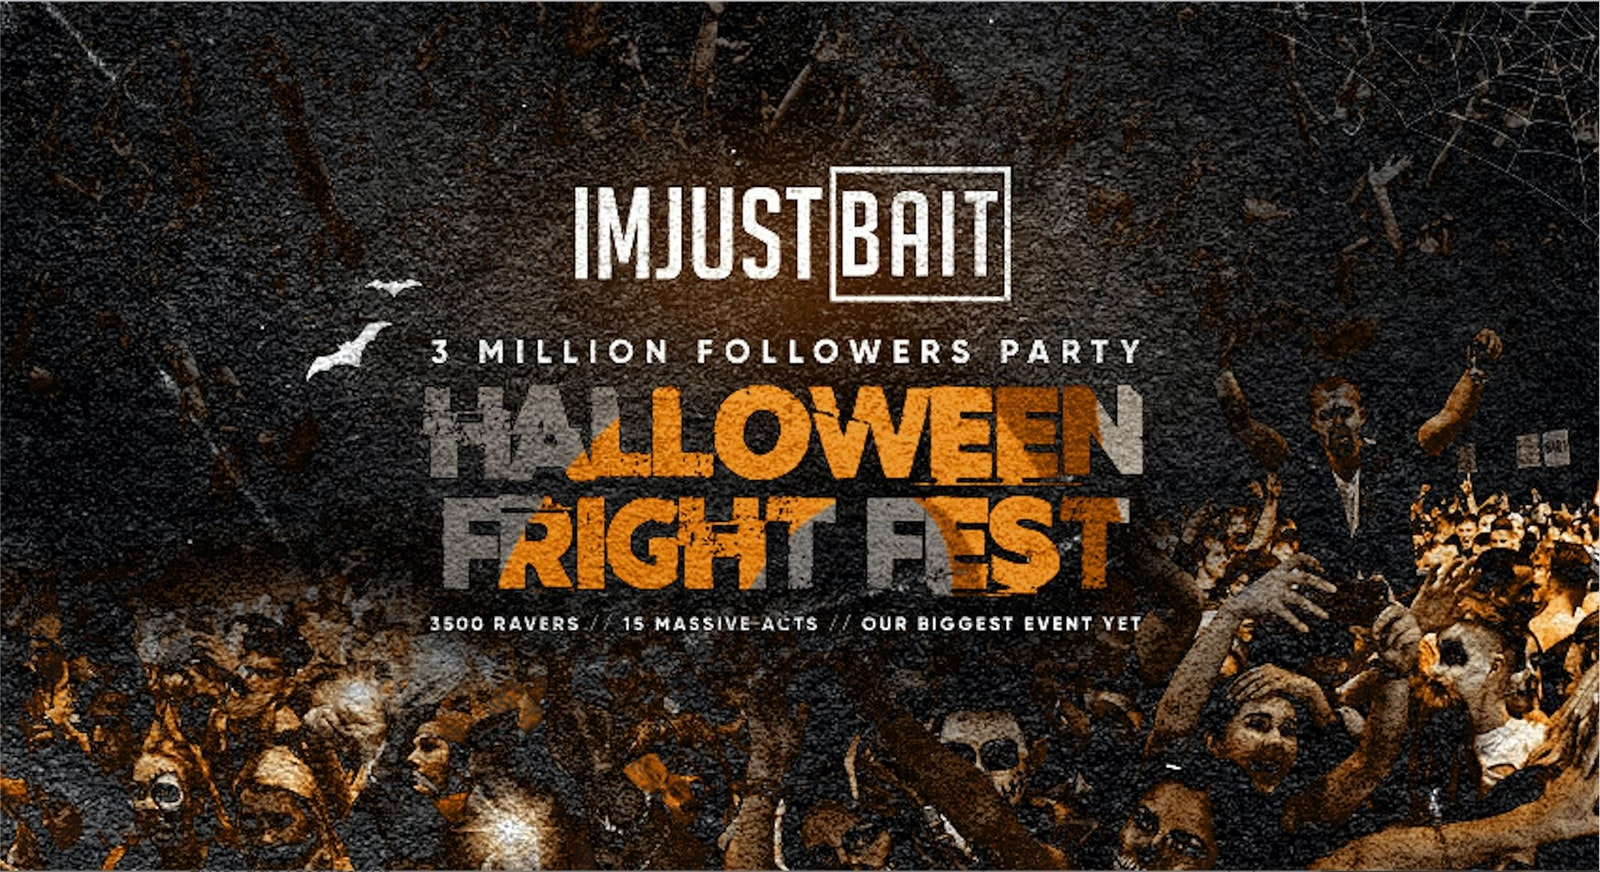 IMJUSTBAIT 3 Million Followers Party! The Halloween Fright Fest!